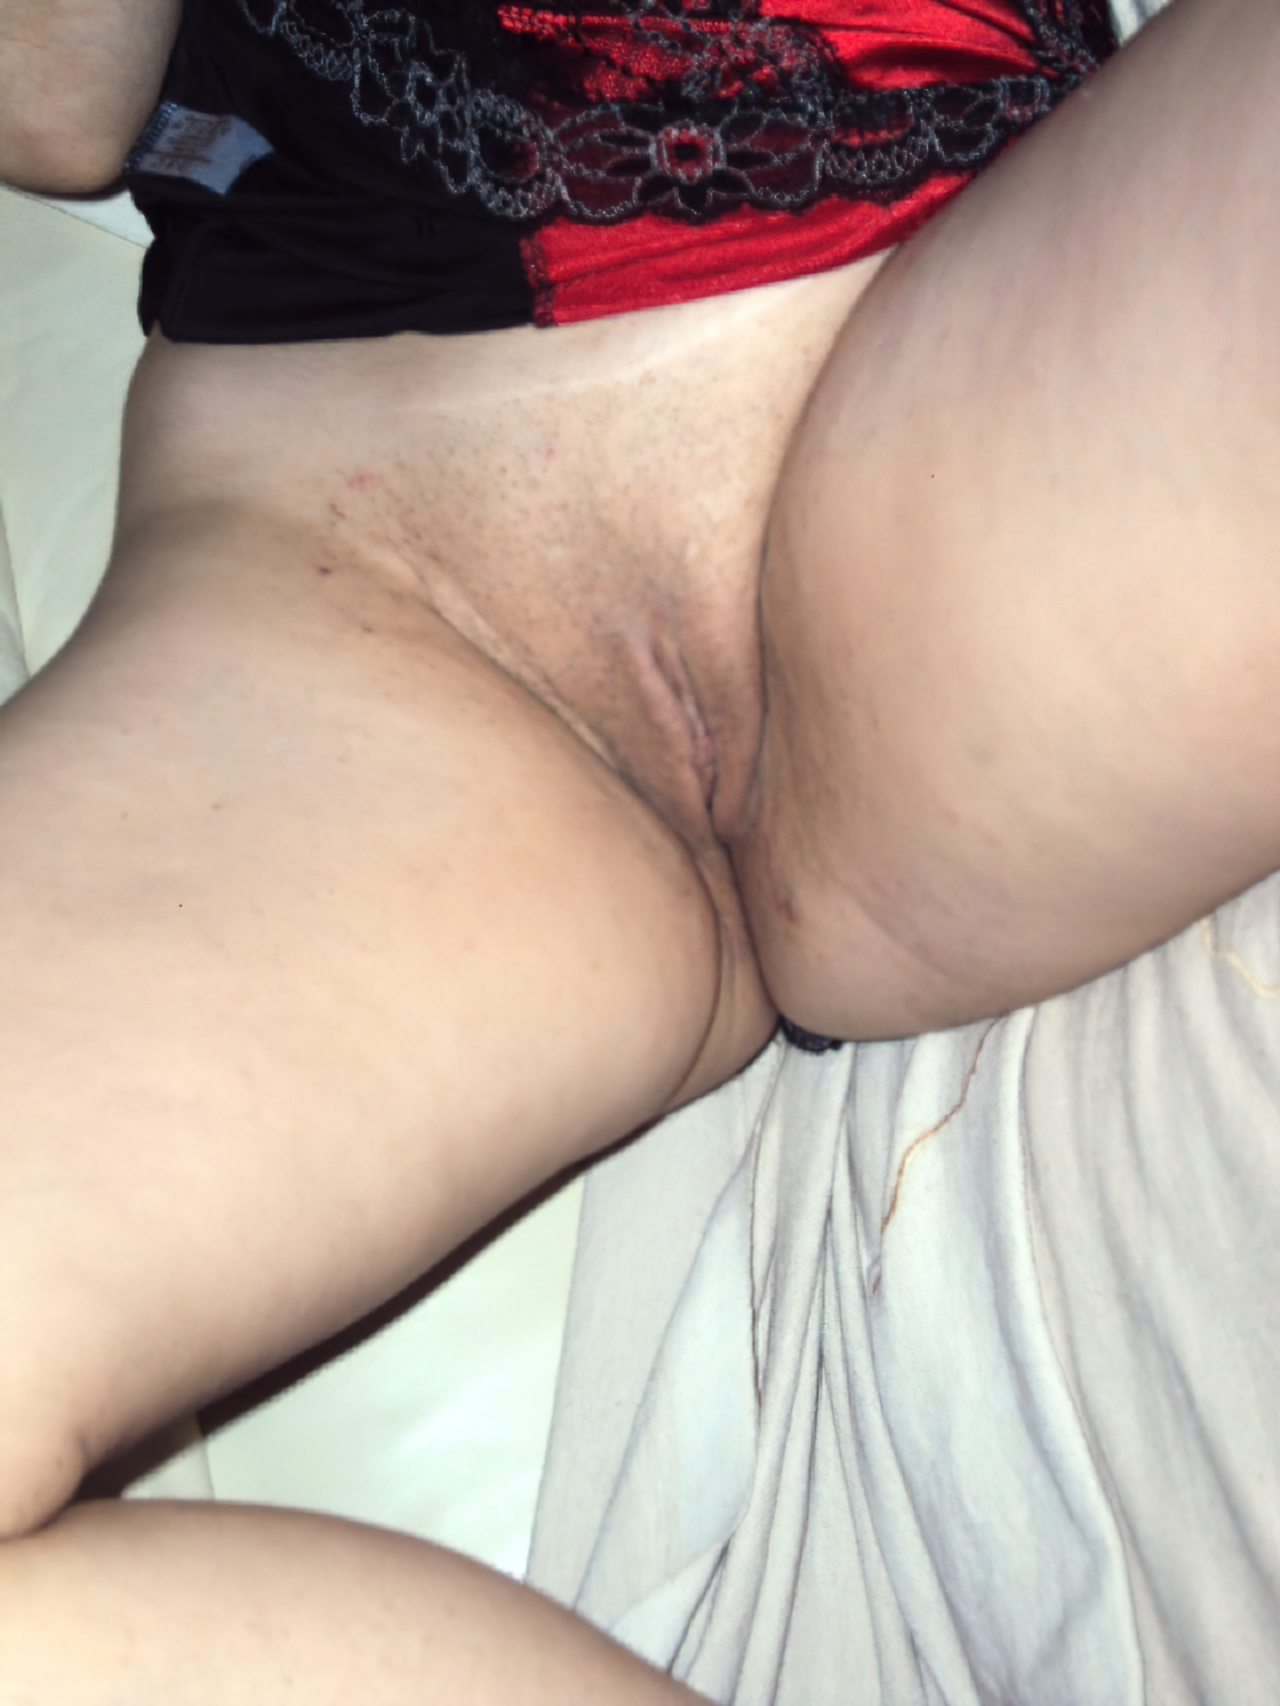 Esposa se Mostrando (23)